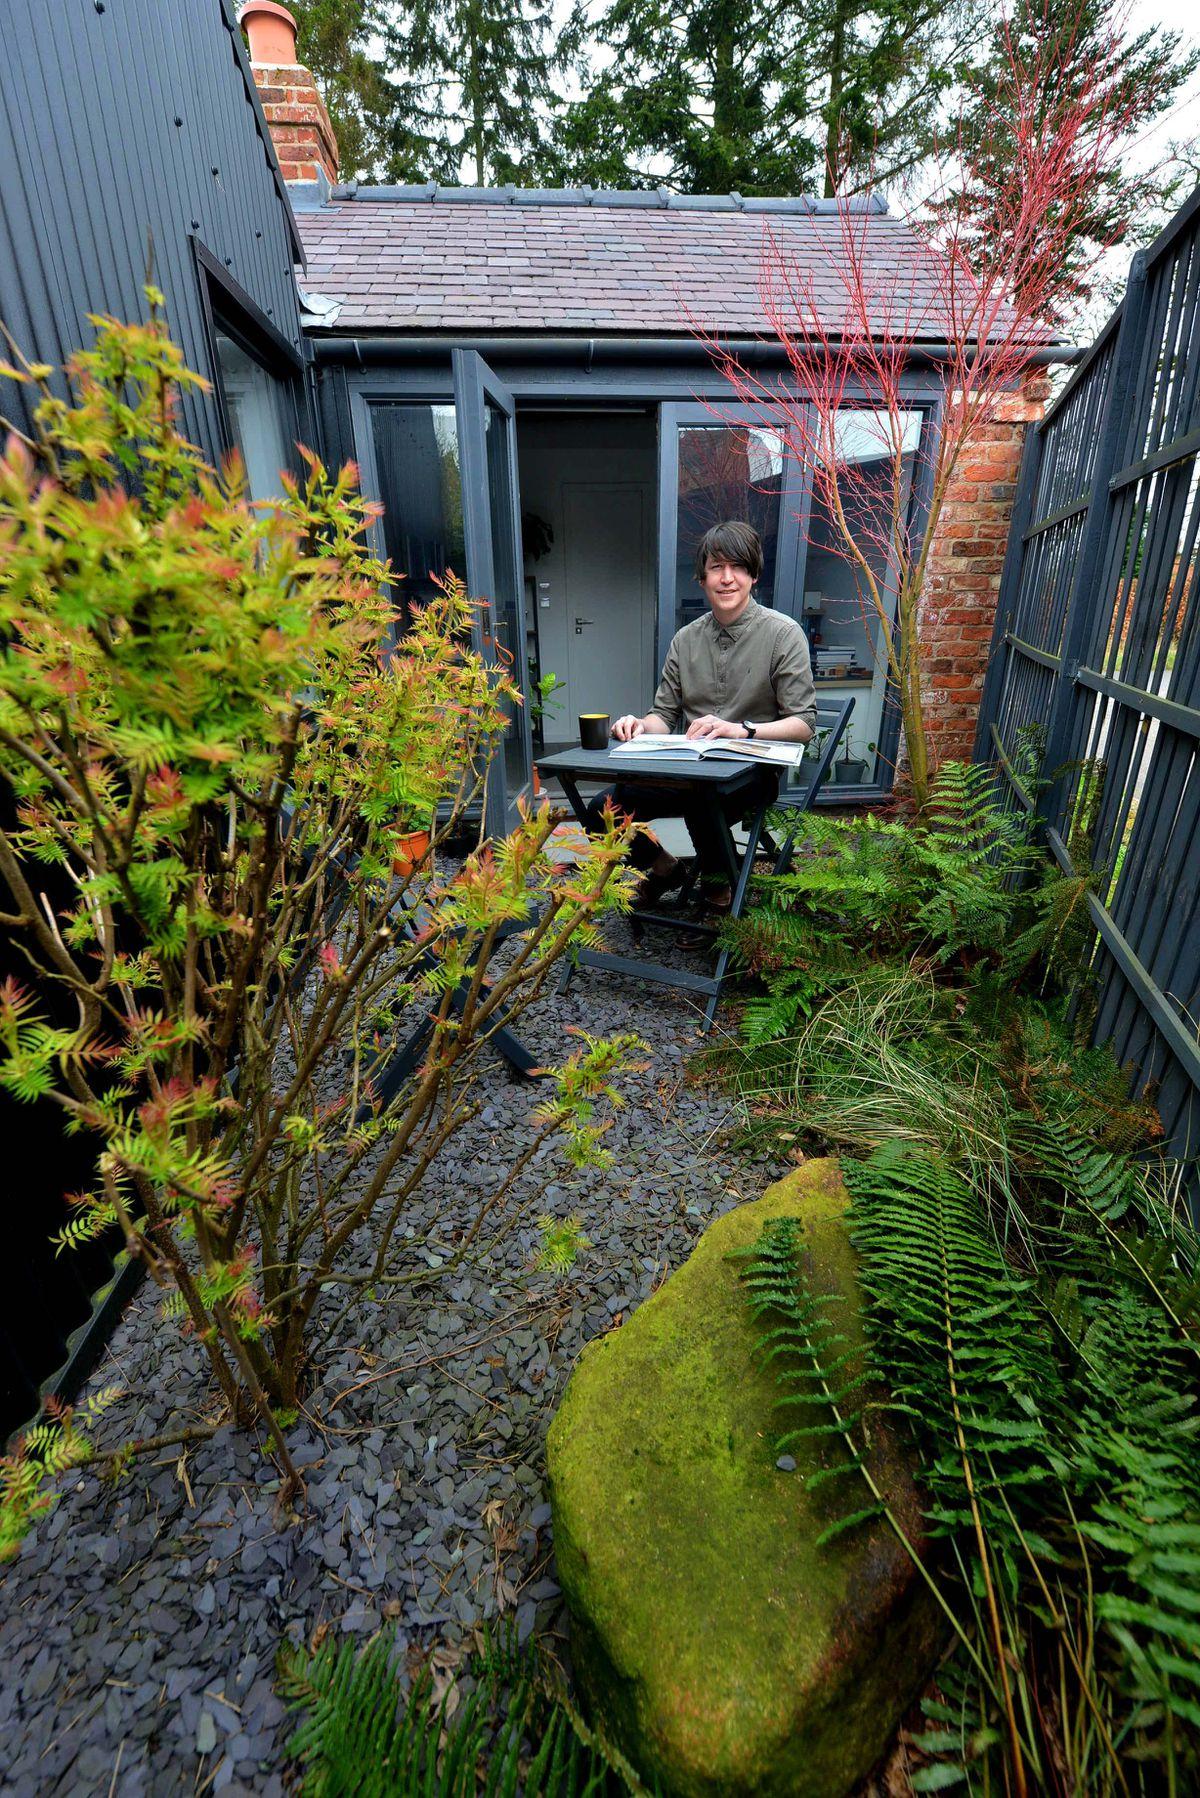 Philip in the courtyard garden